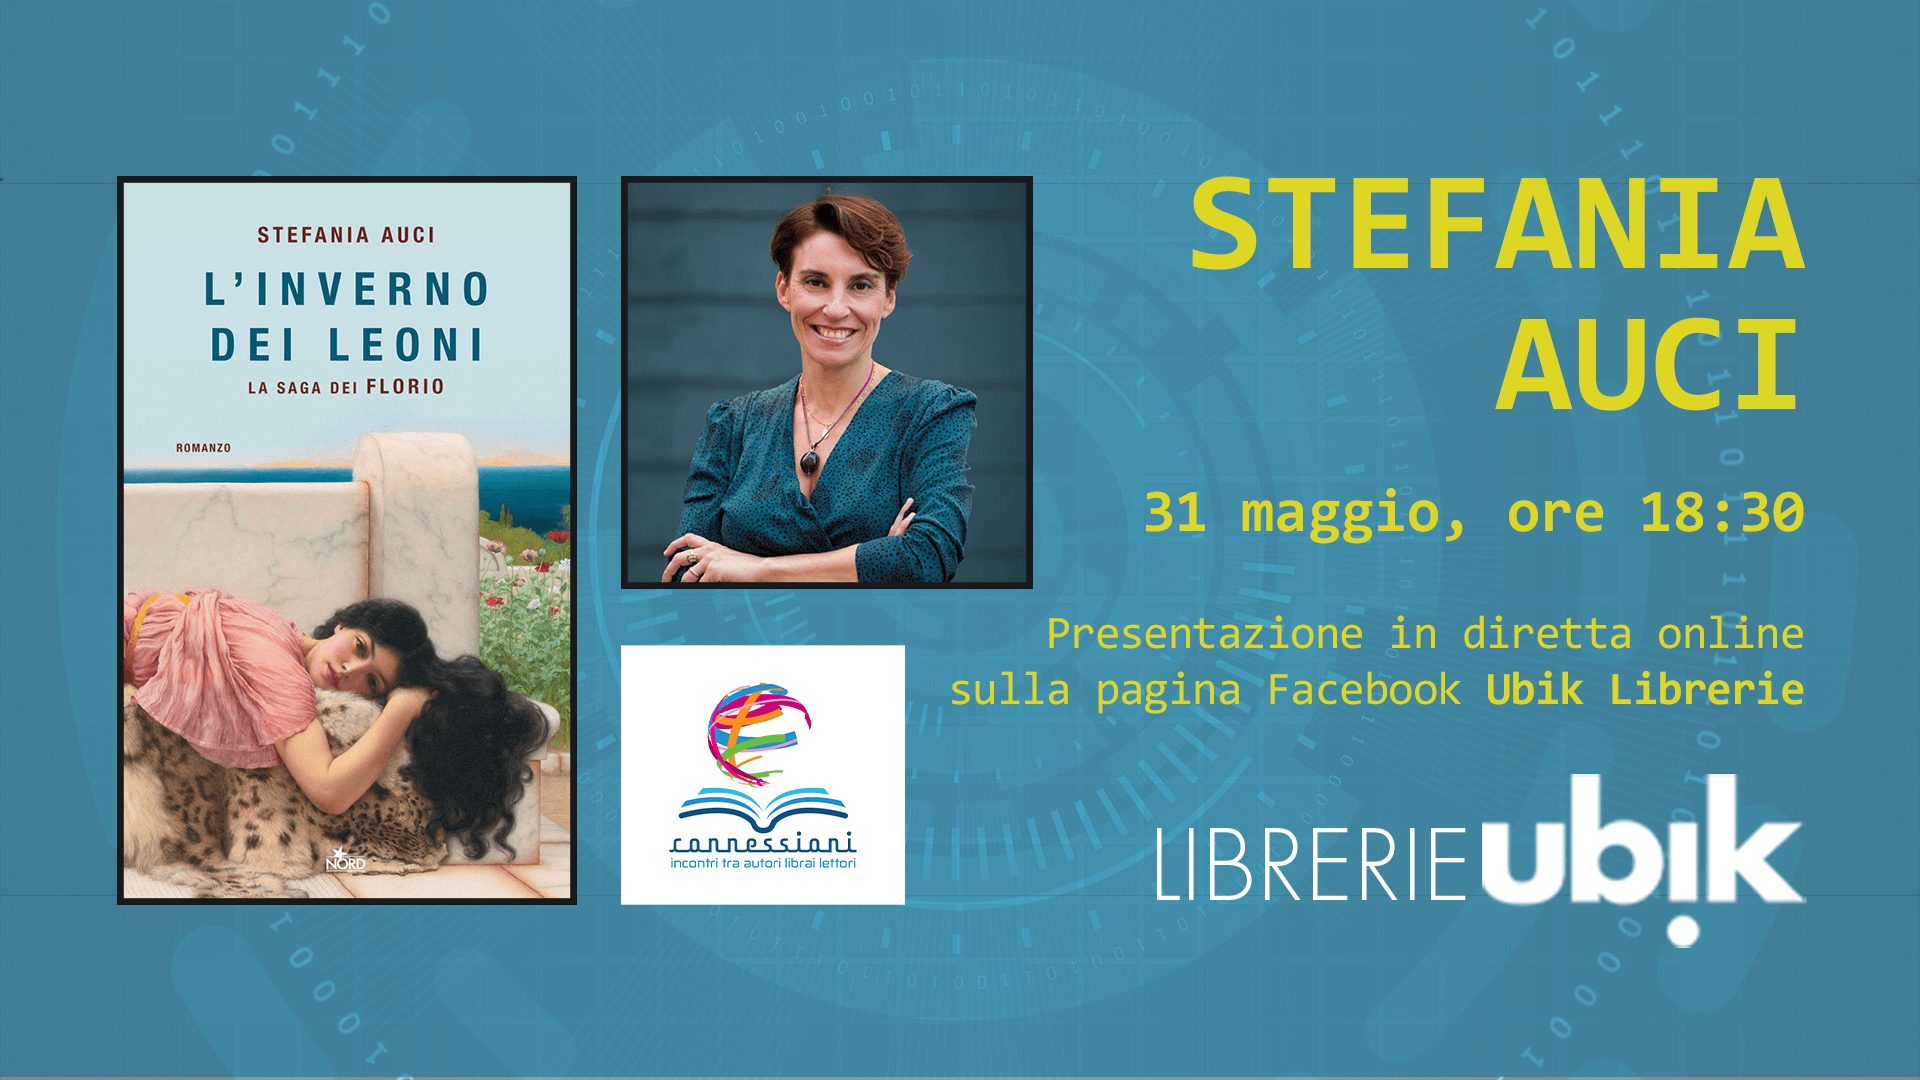 STEFANIA AUCI presenta in diretta online